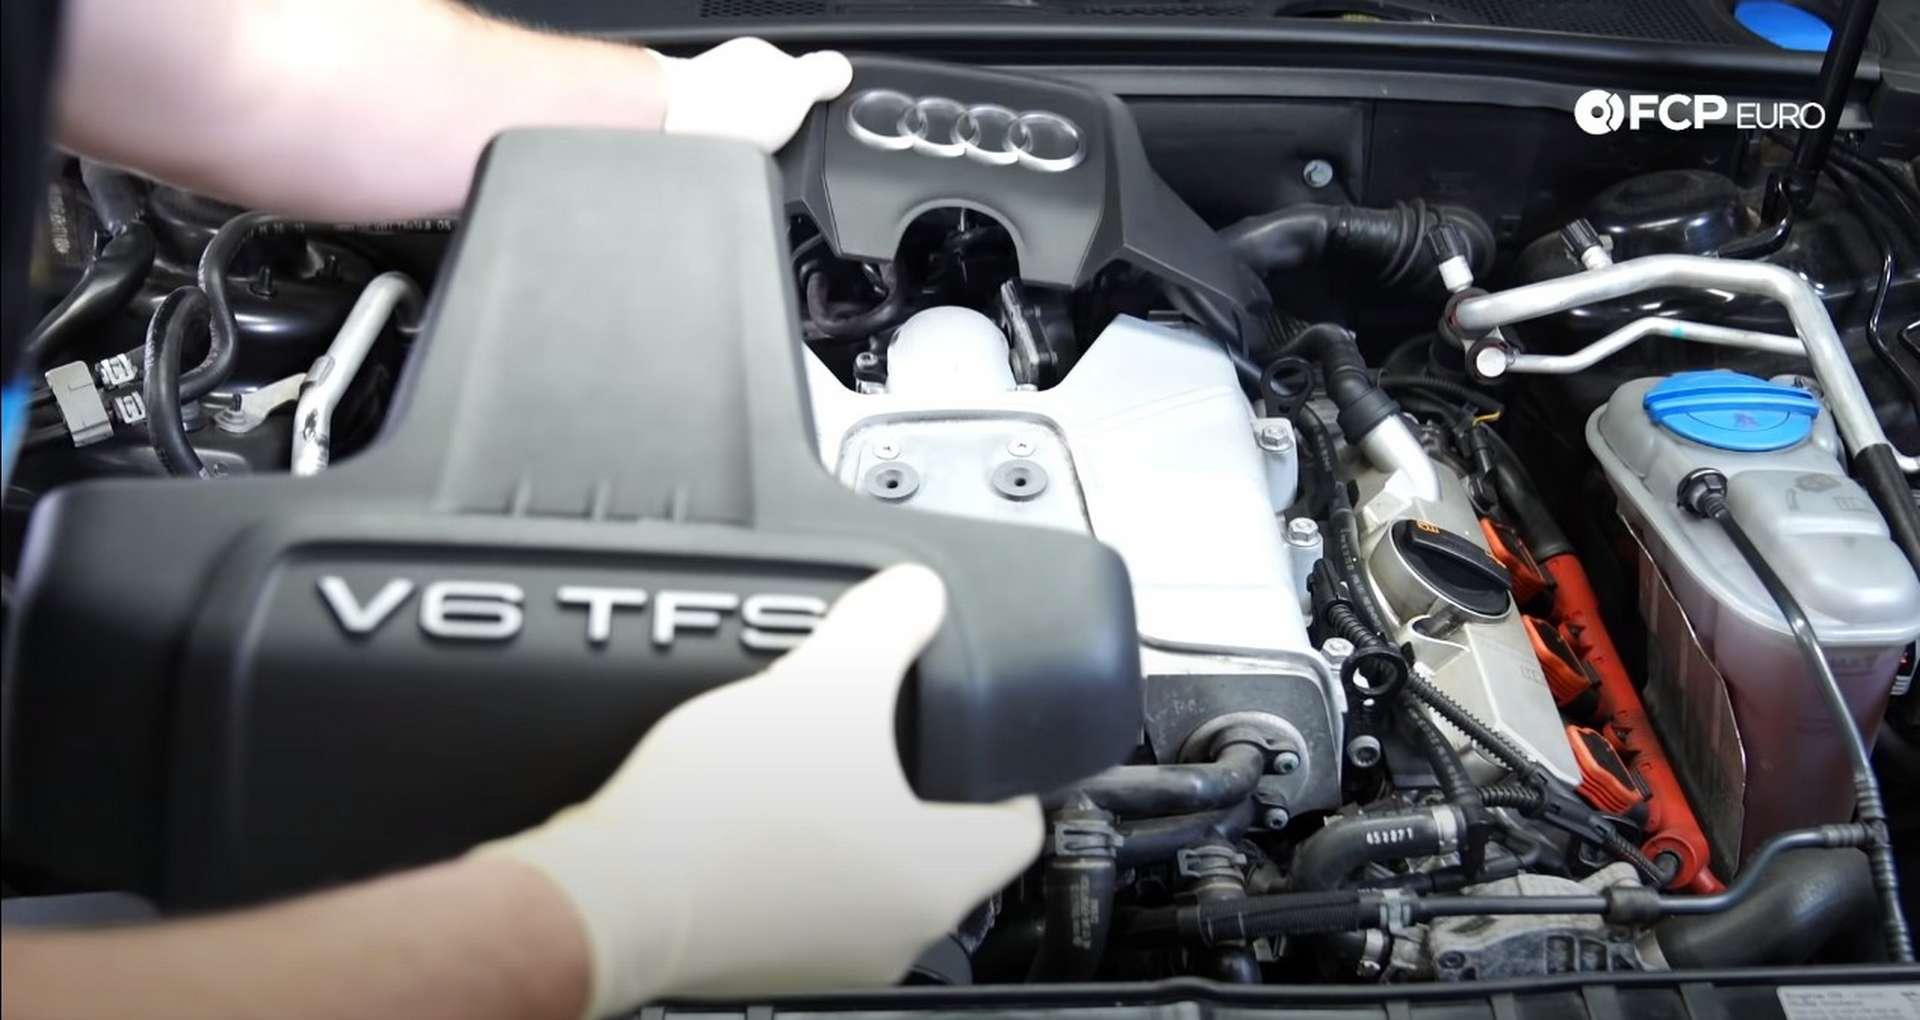 DIY Audi 3.0t Walnut Blasting Intake Valves removing the dress-up covers